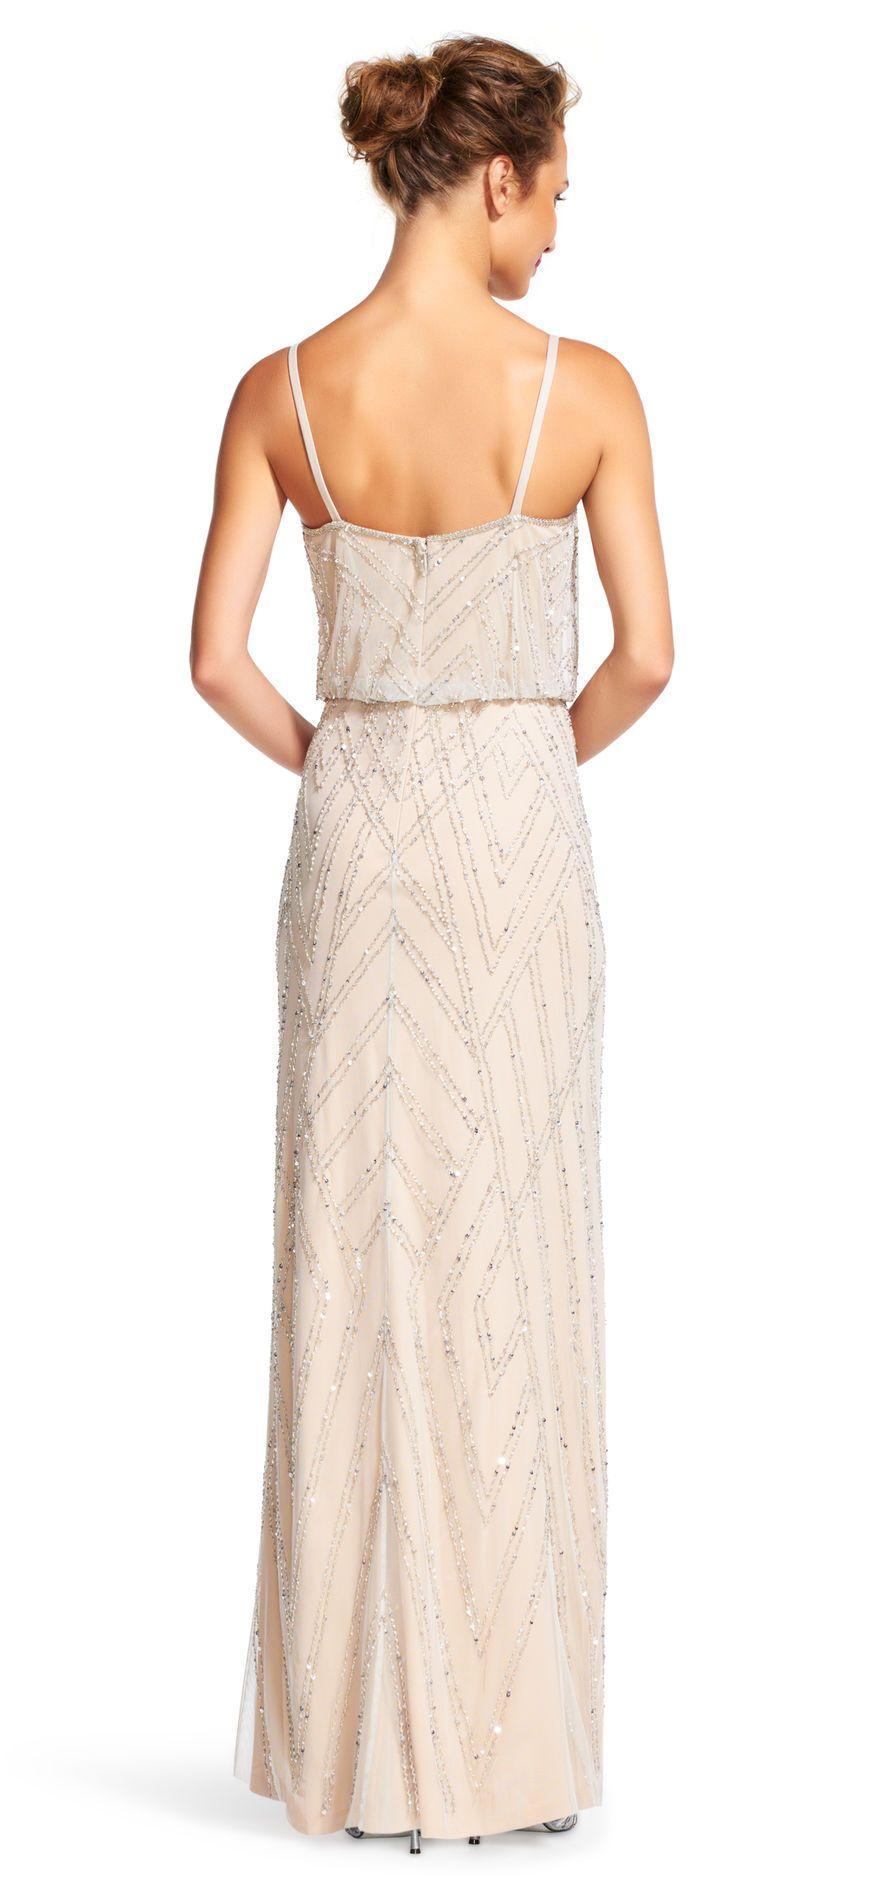 Diamond Beaded Blouson Dress Gold bridesmaid dresses